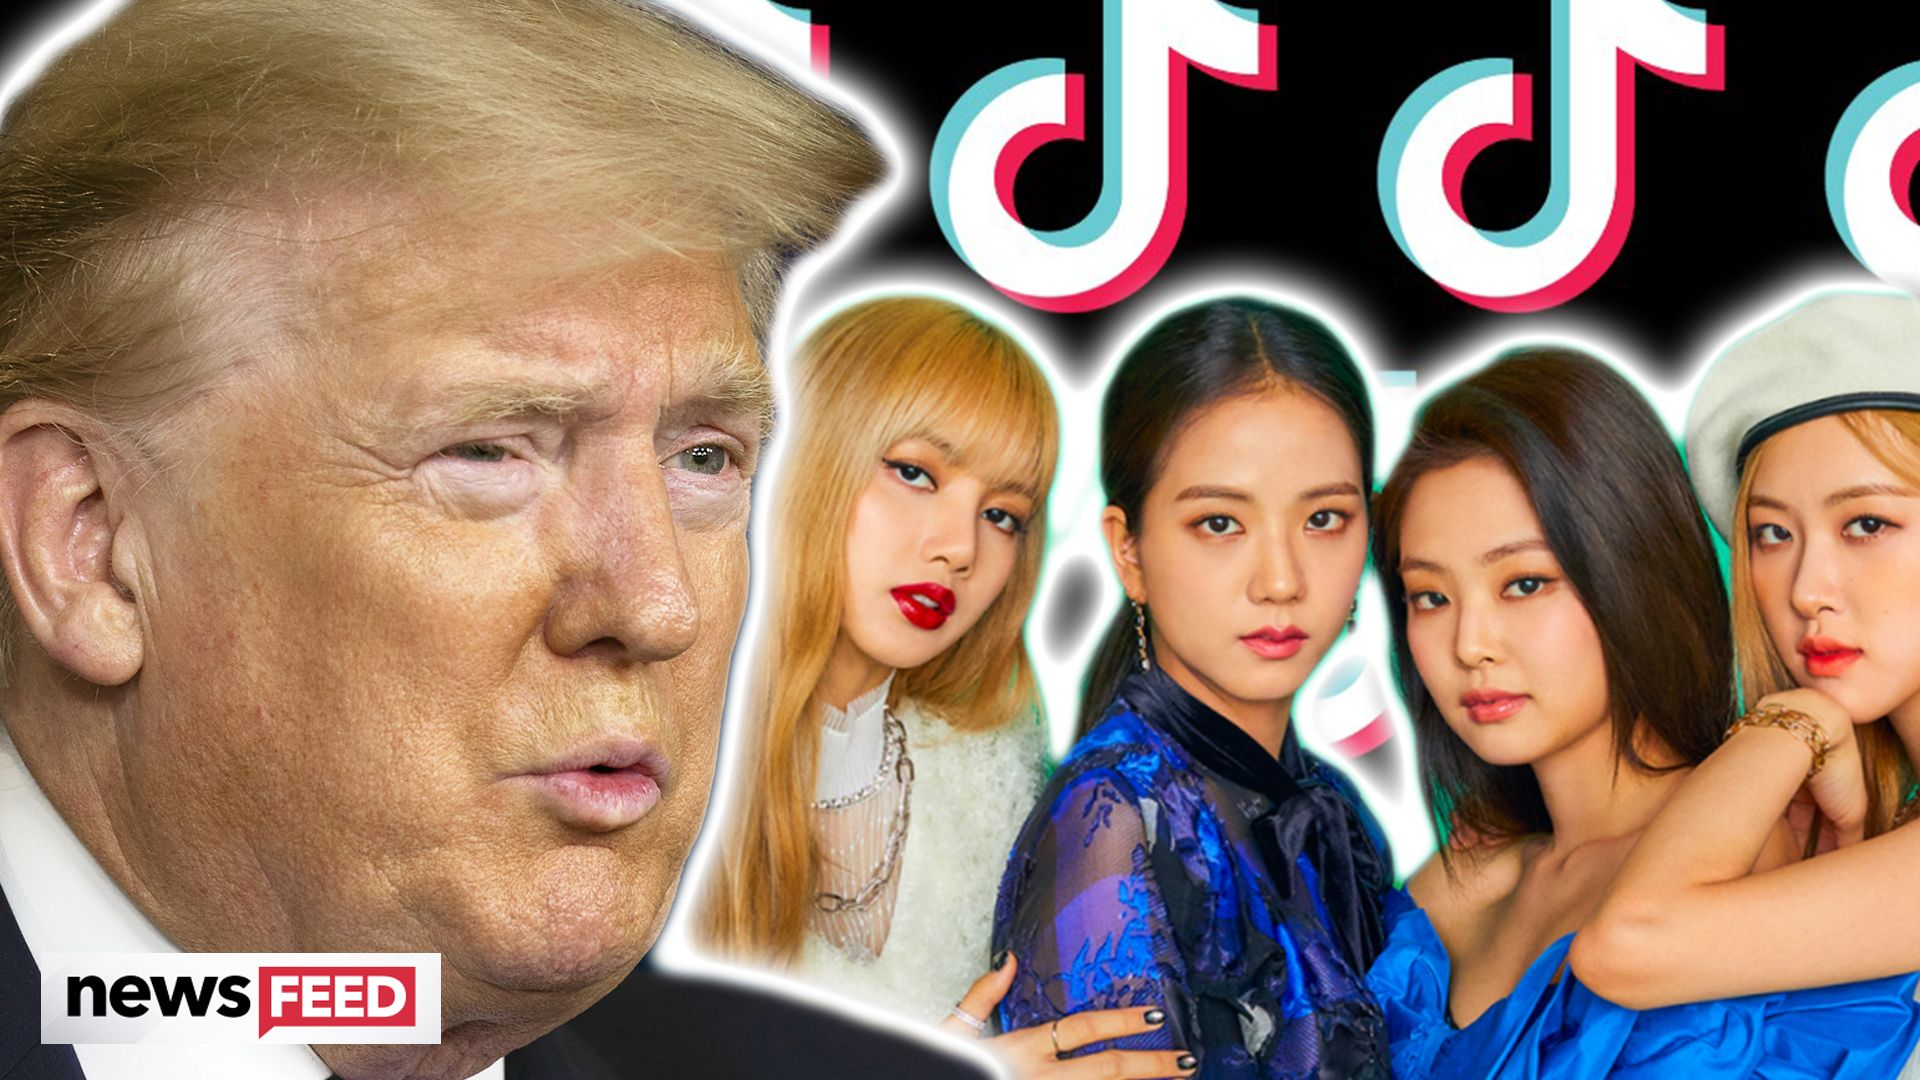 #ImpeachBidenNow hashtag hijacked by K-Pop fans